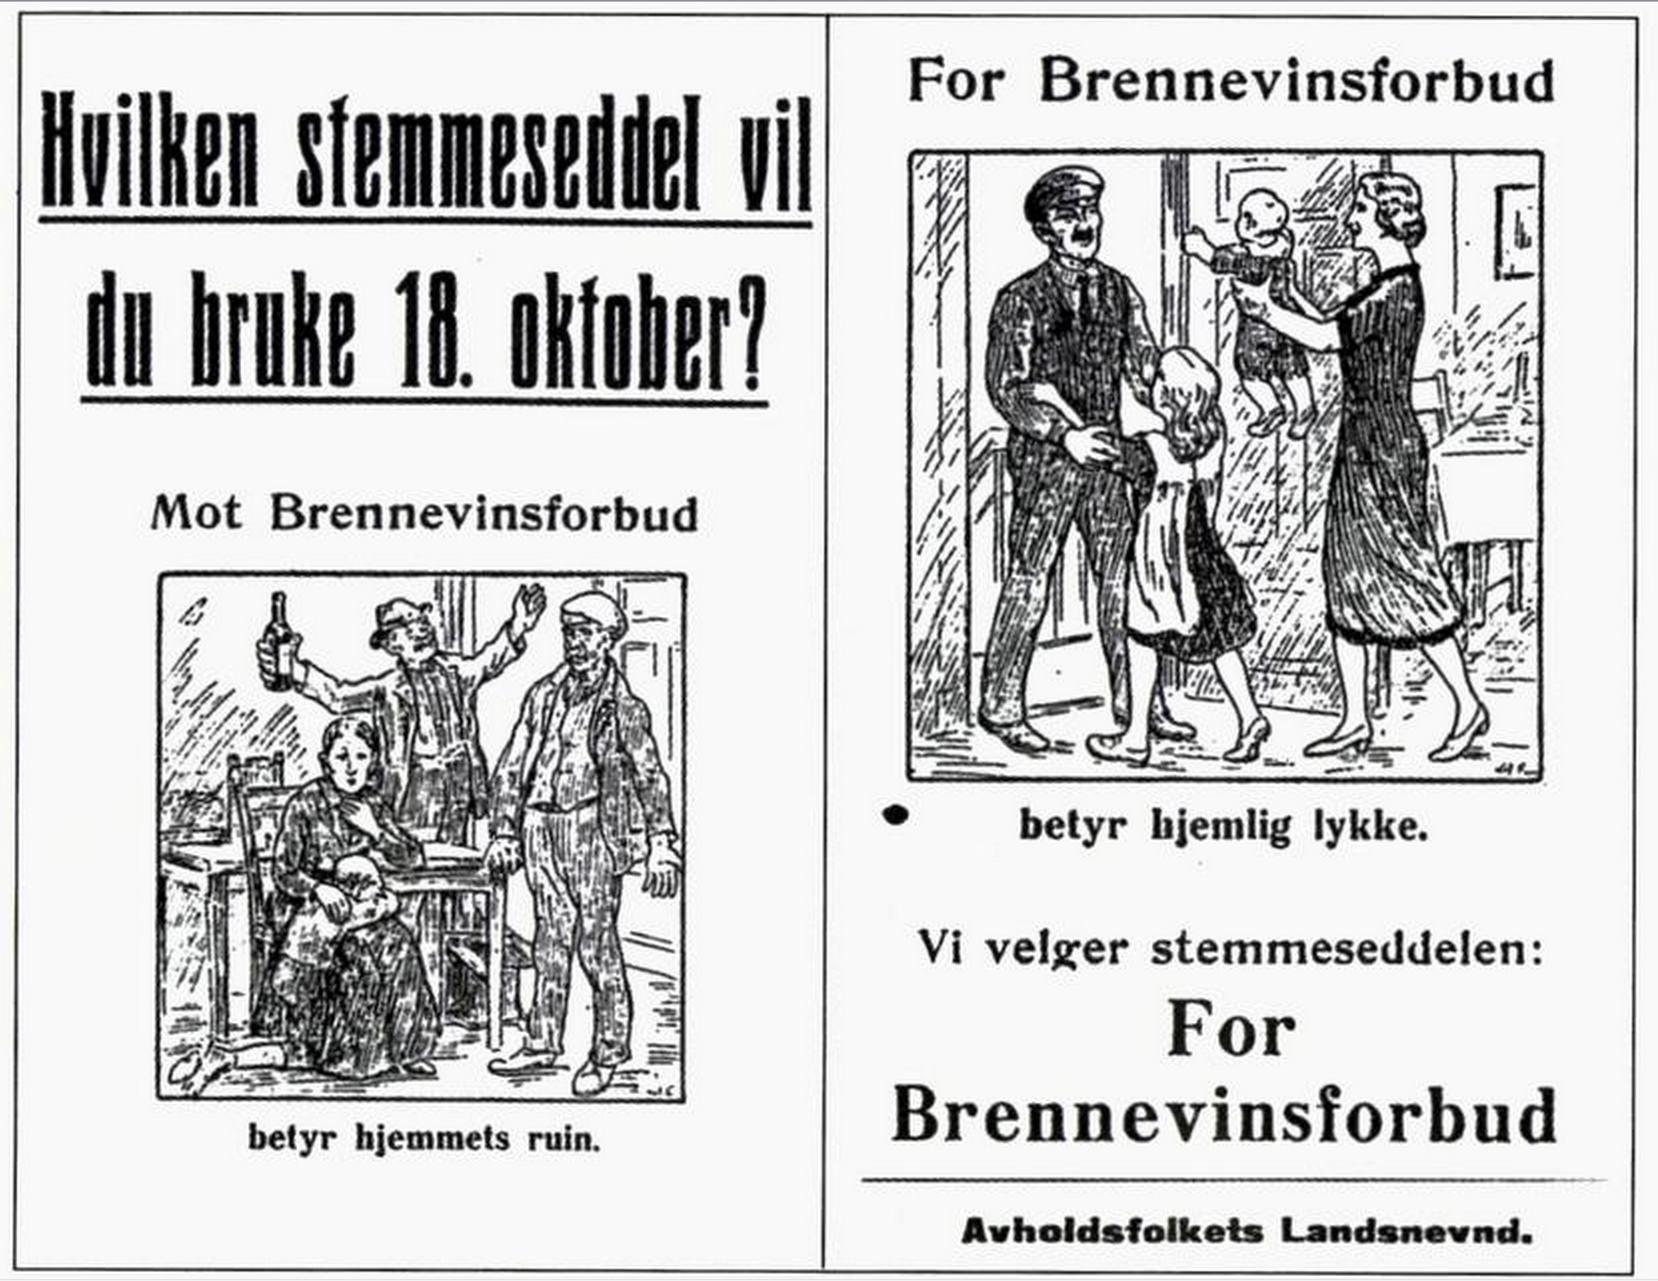 Valgplakat til folkeavstemning om brennevinsforbud 1926